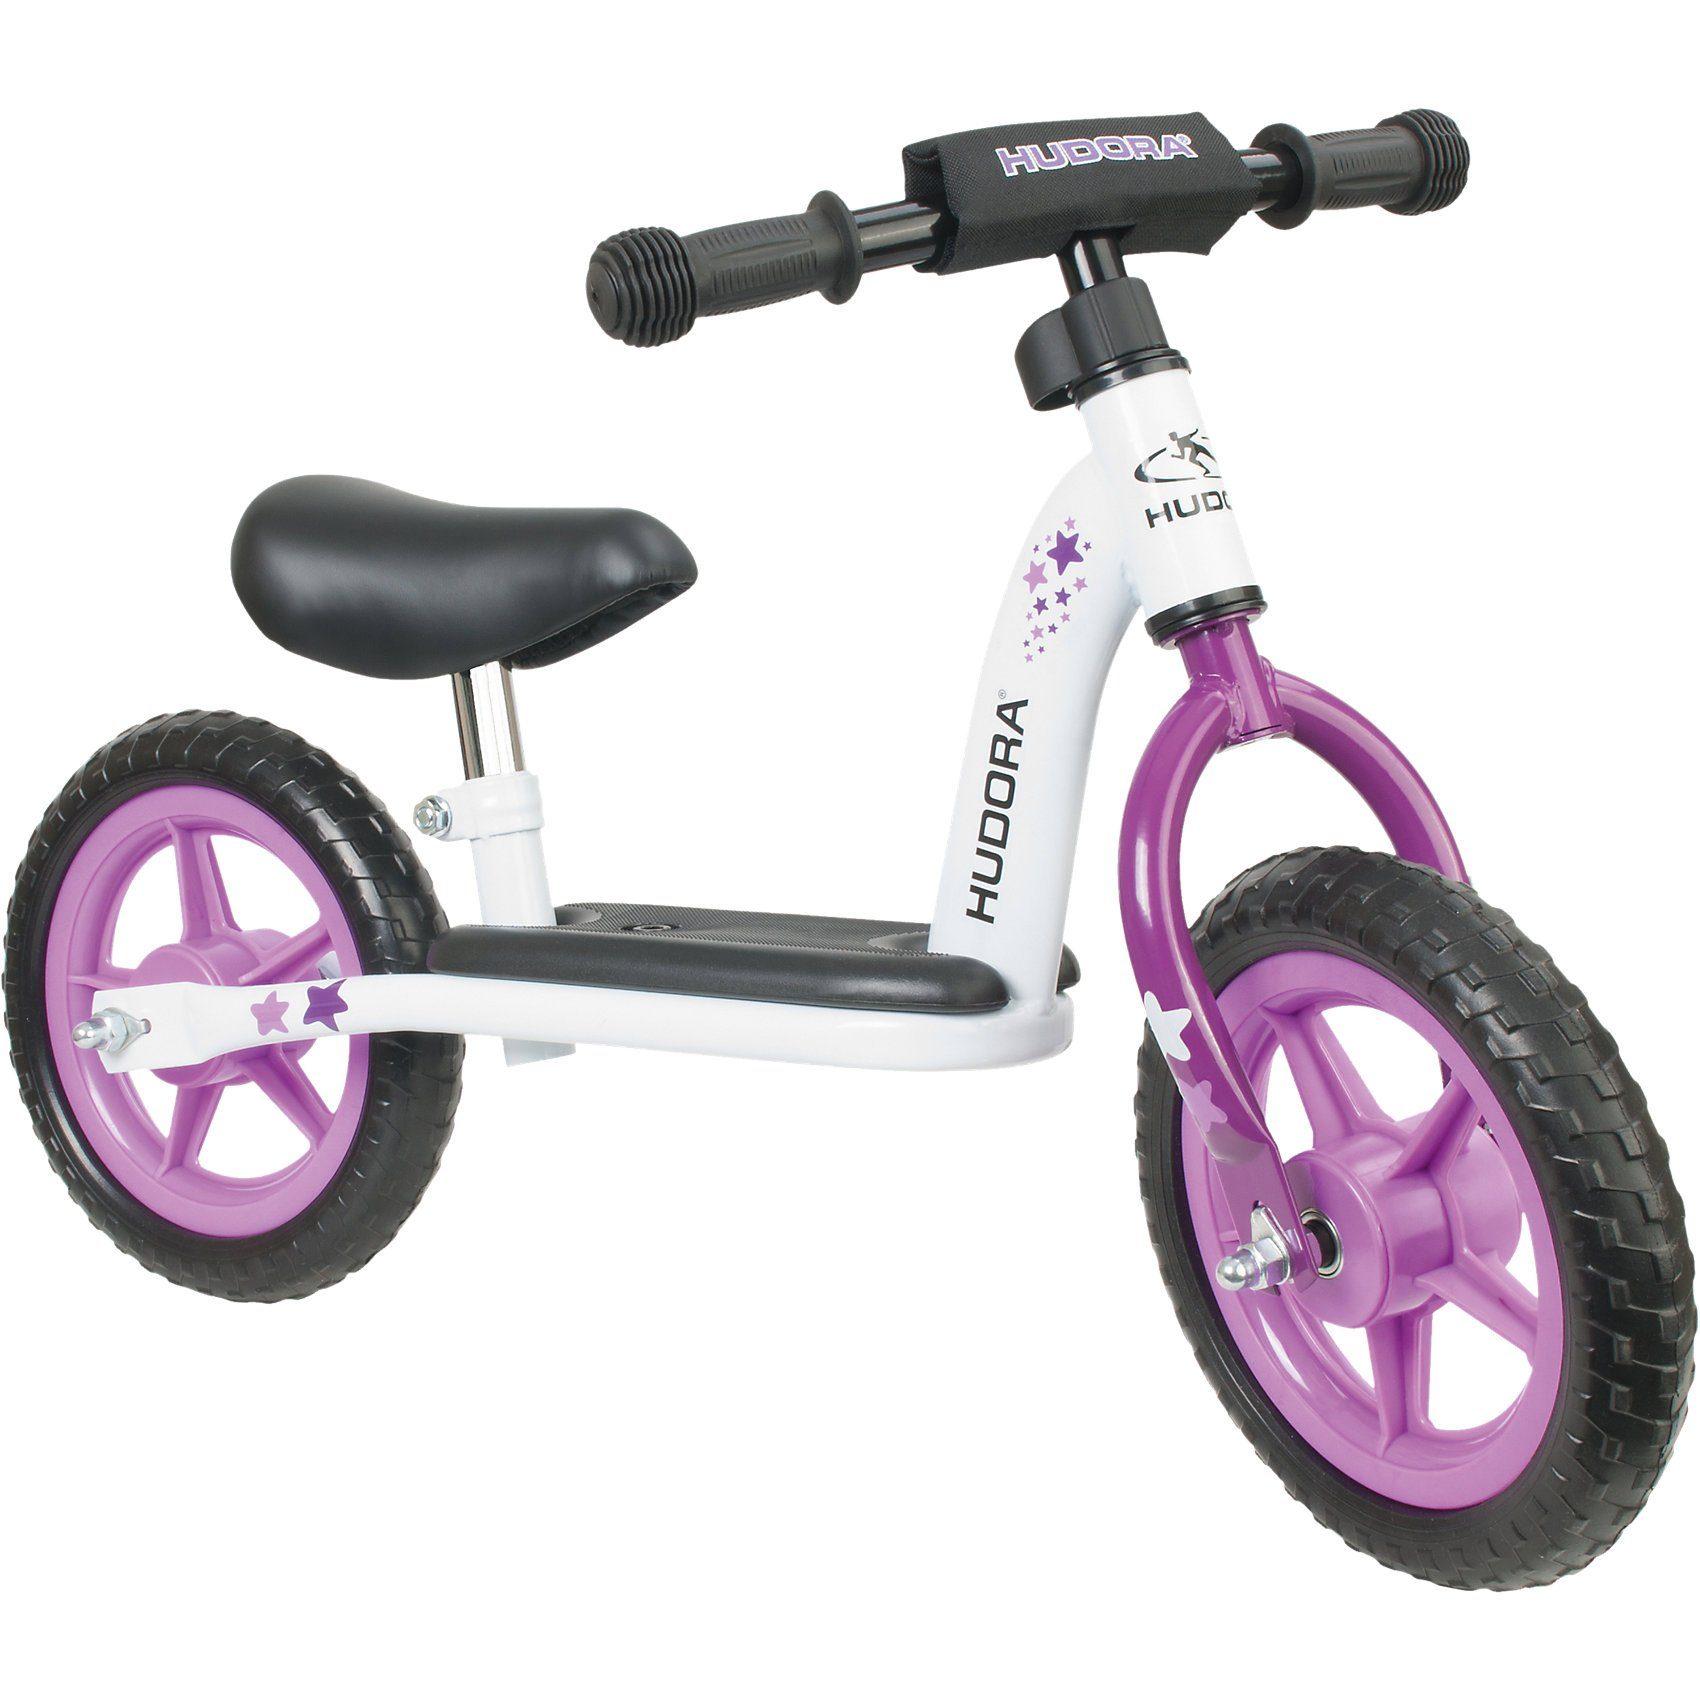 Hudora Laufrad Toddler 10 Zoll girl